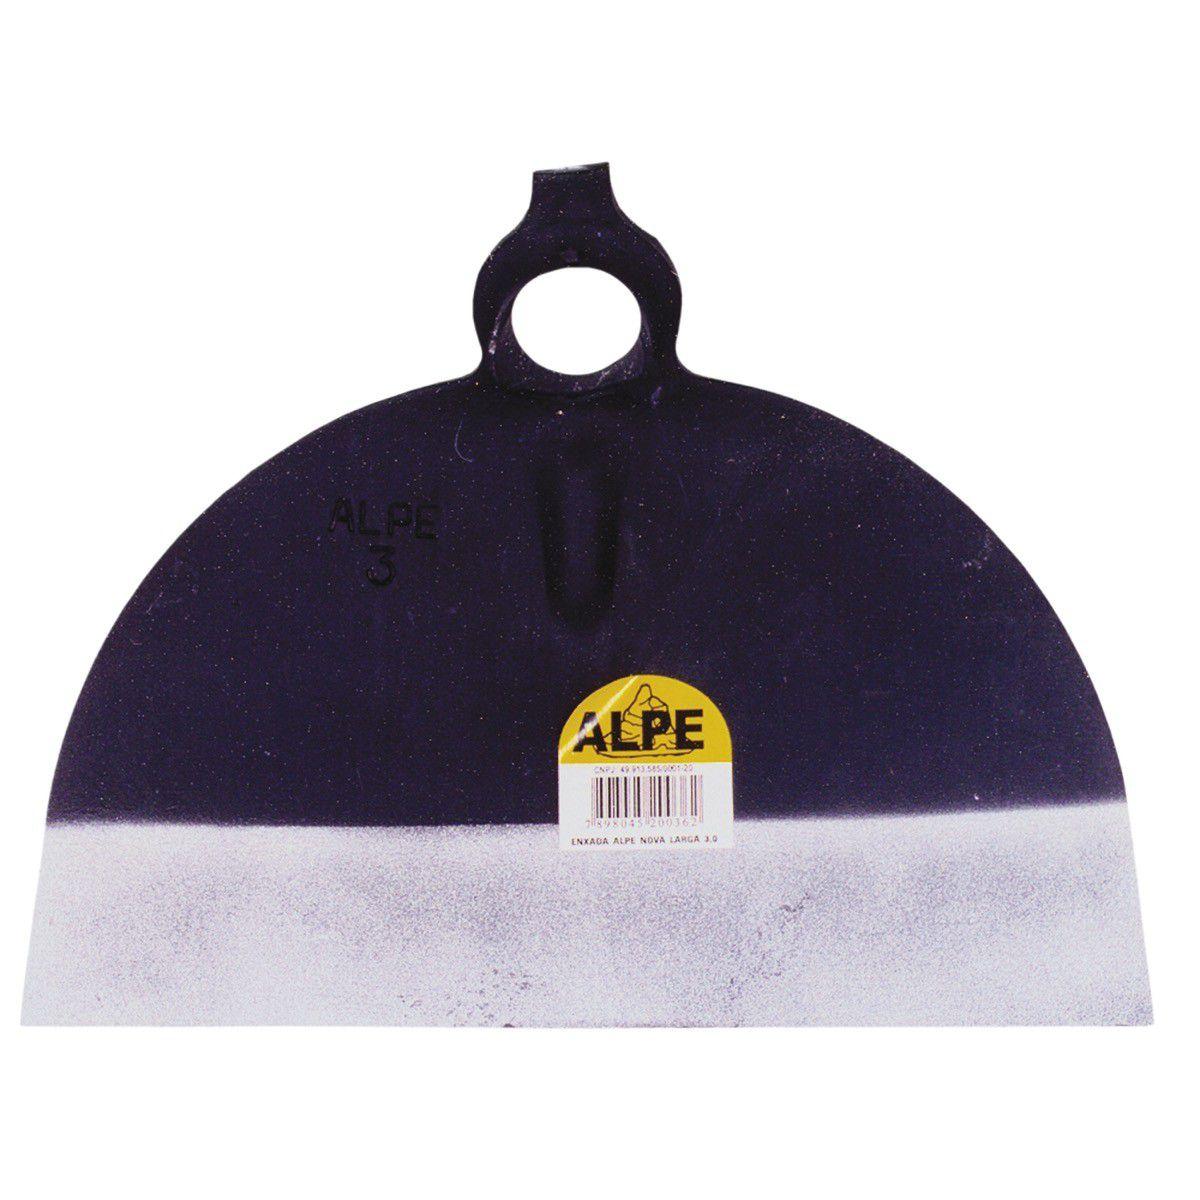 Enxada Alpe Nova S/ Solda 2,5 Libras Larga Cx/6